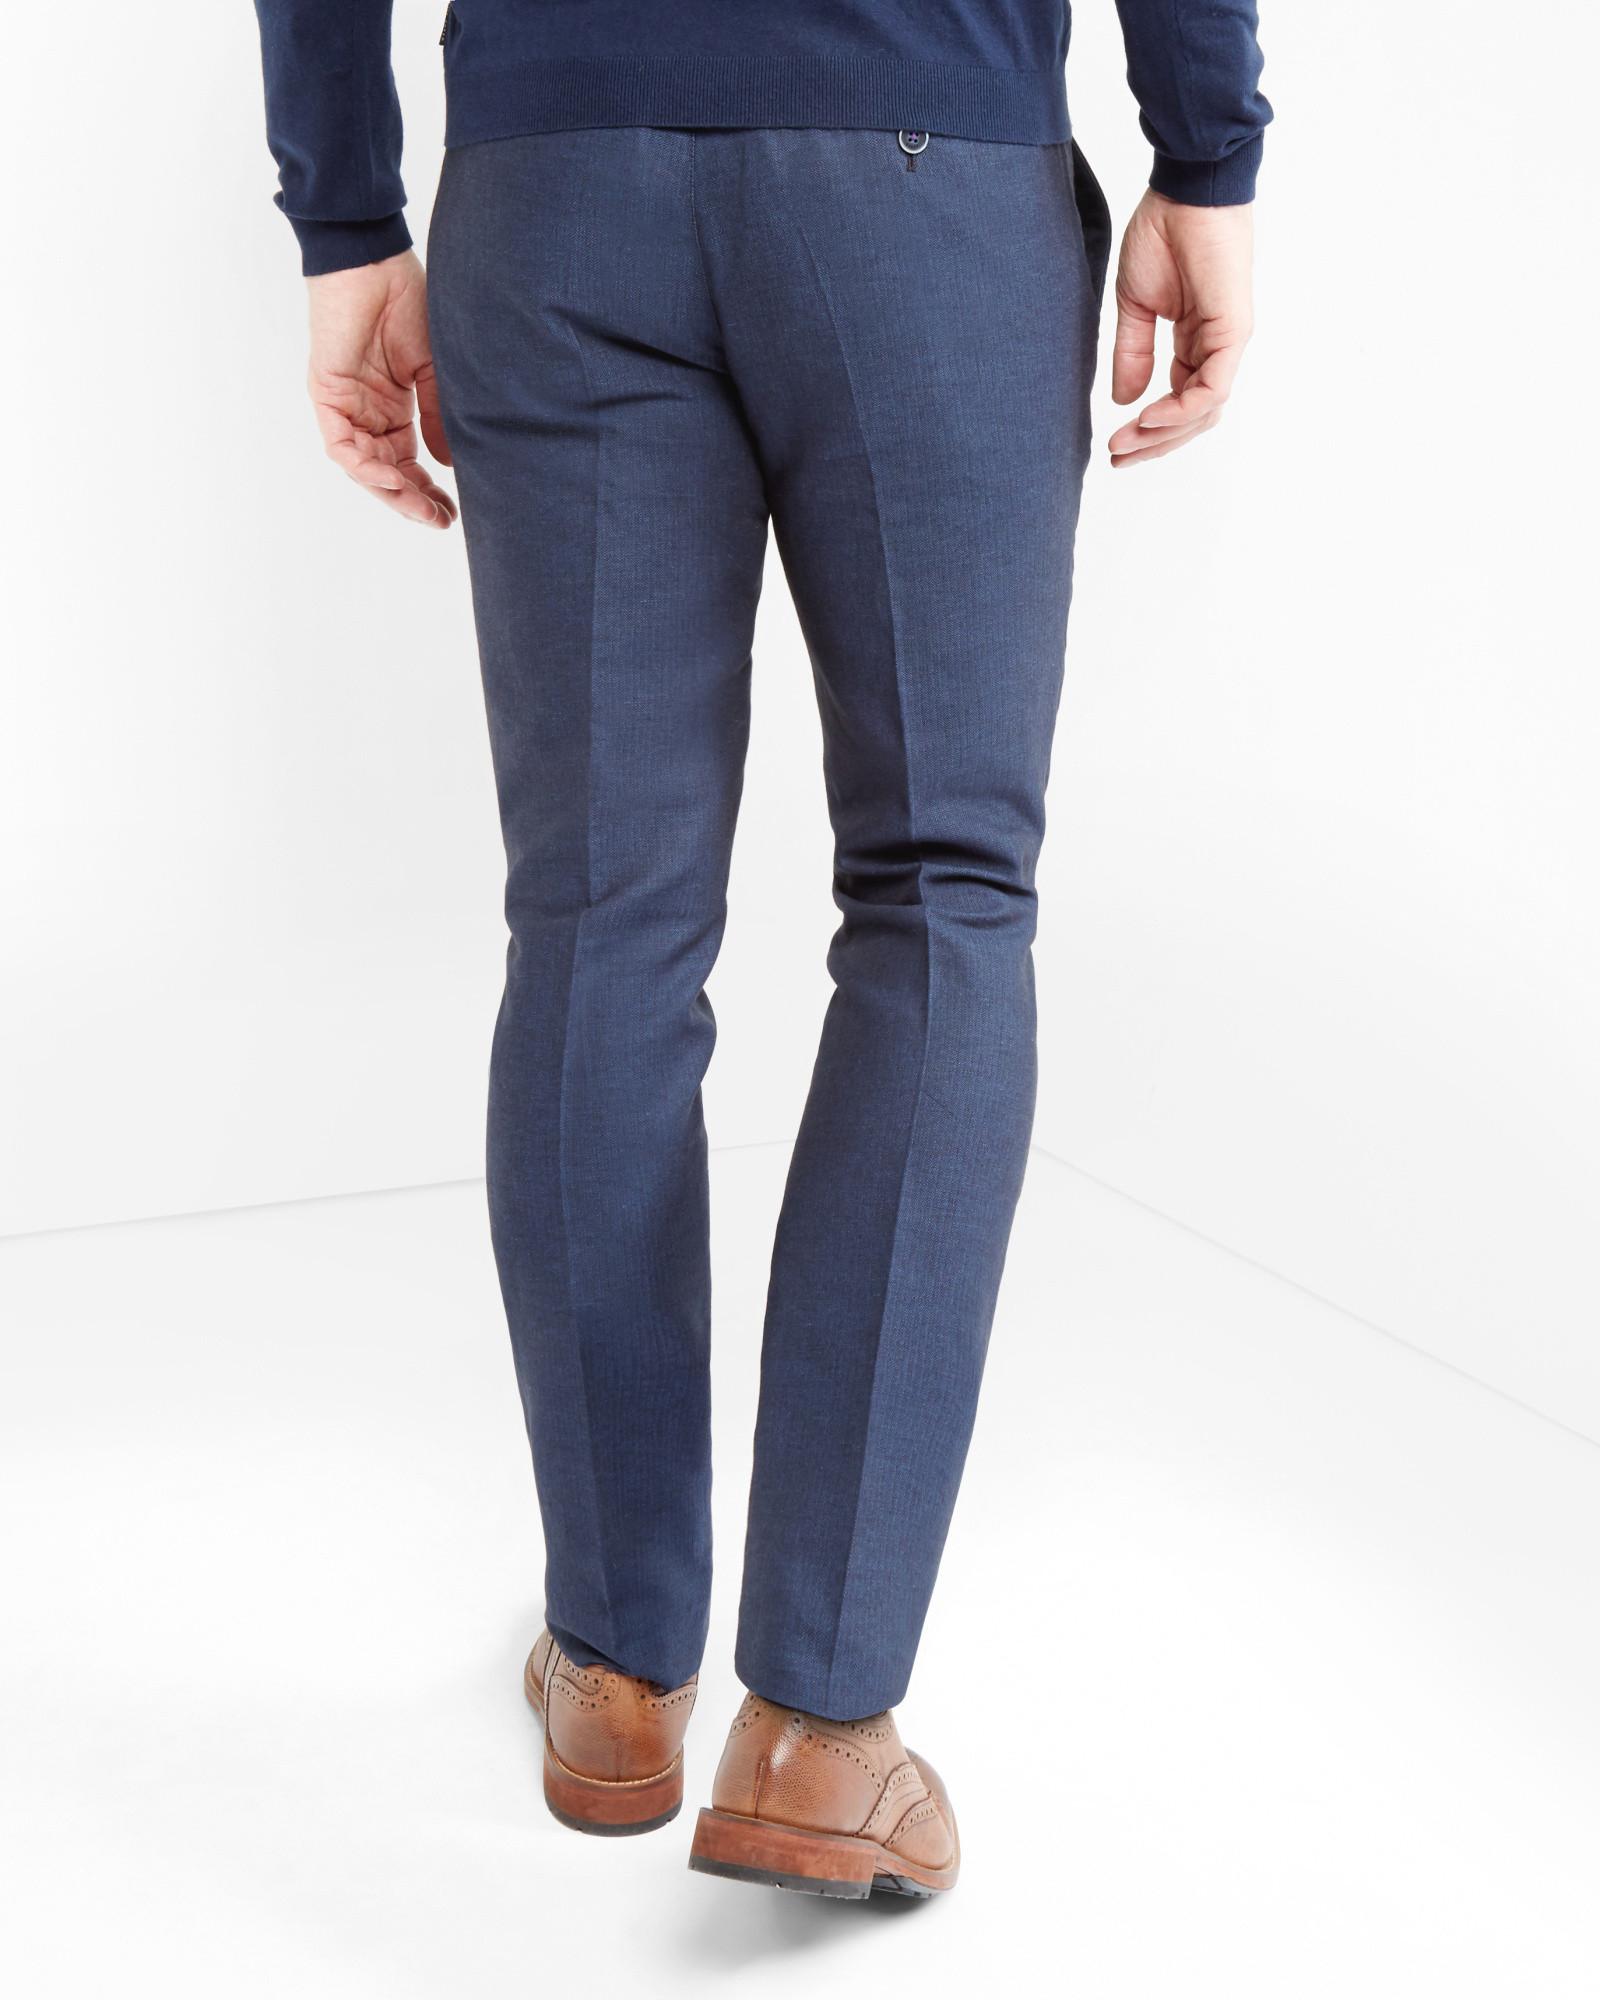 8b816a24226db0 Lyst - Ted Baker Linen Herringbone Pants in Blue for Men